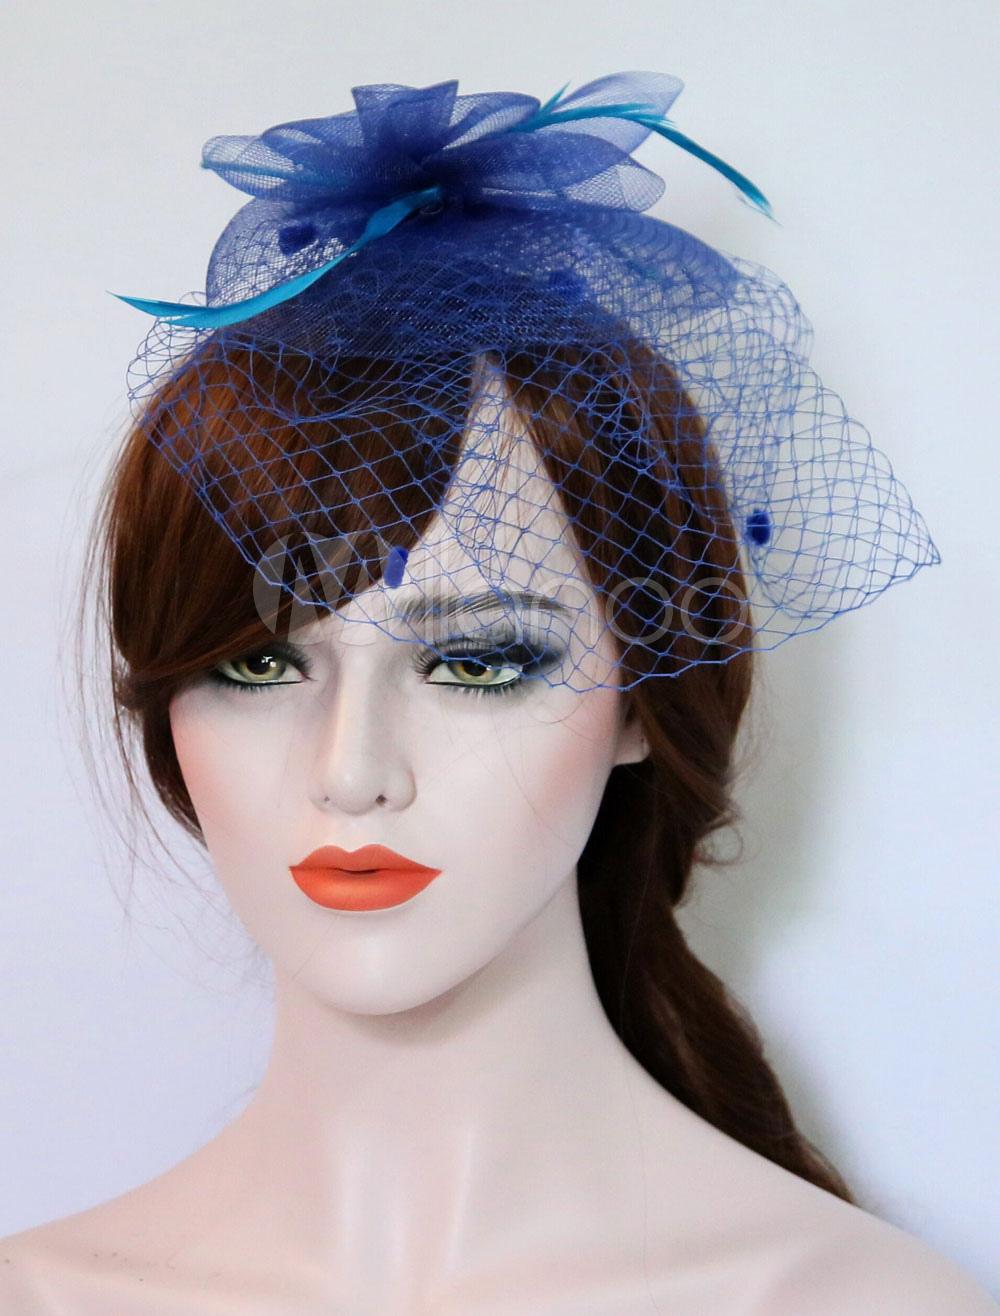 ... Tulle Fascinator Hat Wedding Royal Blue Feathers Vintage Bridal  Headpieces-No.4 ... 8764586f6c0